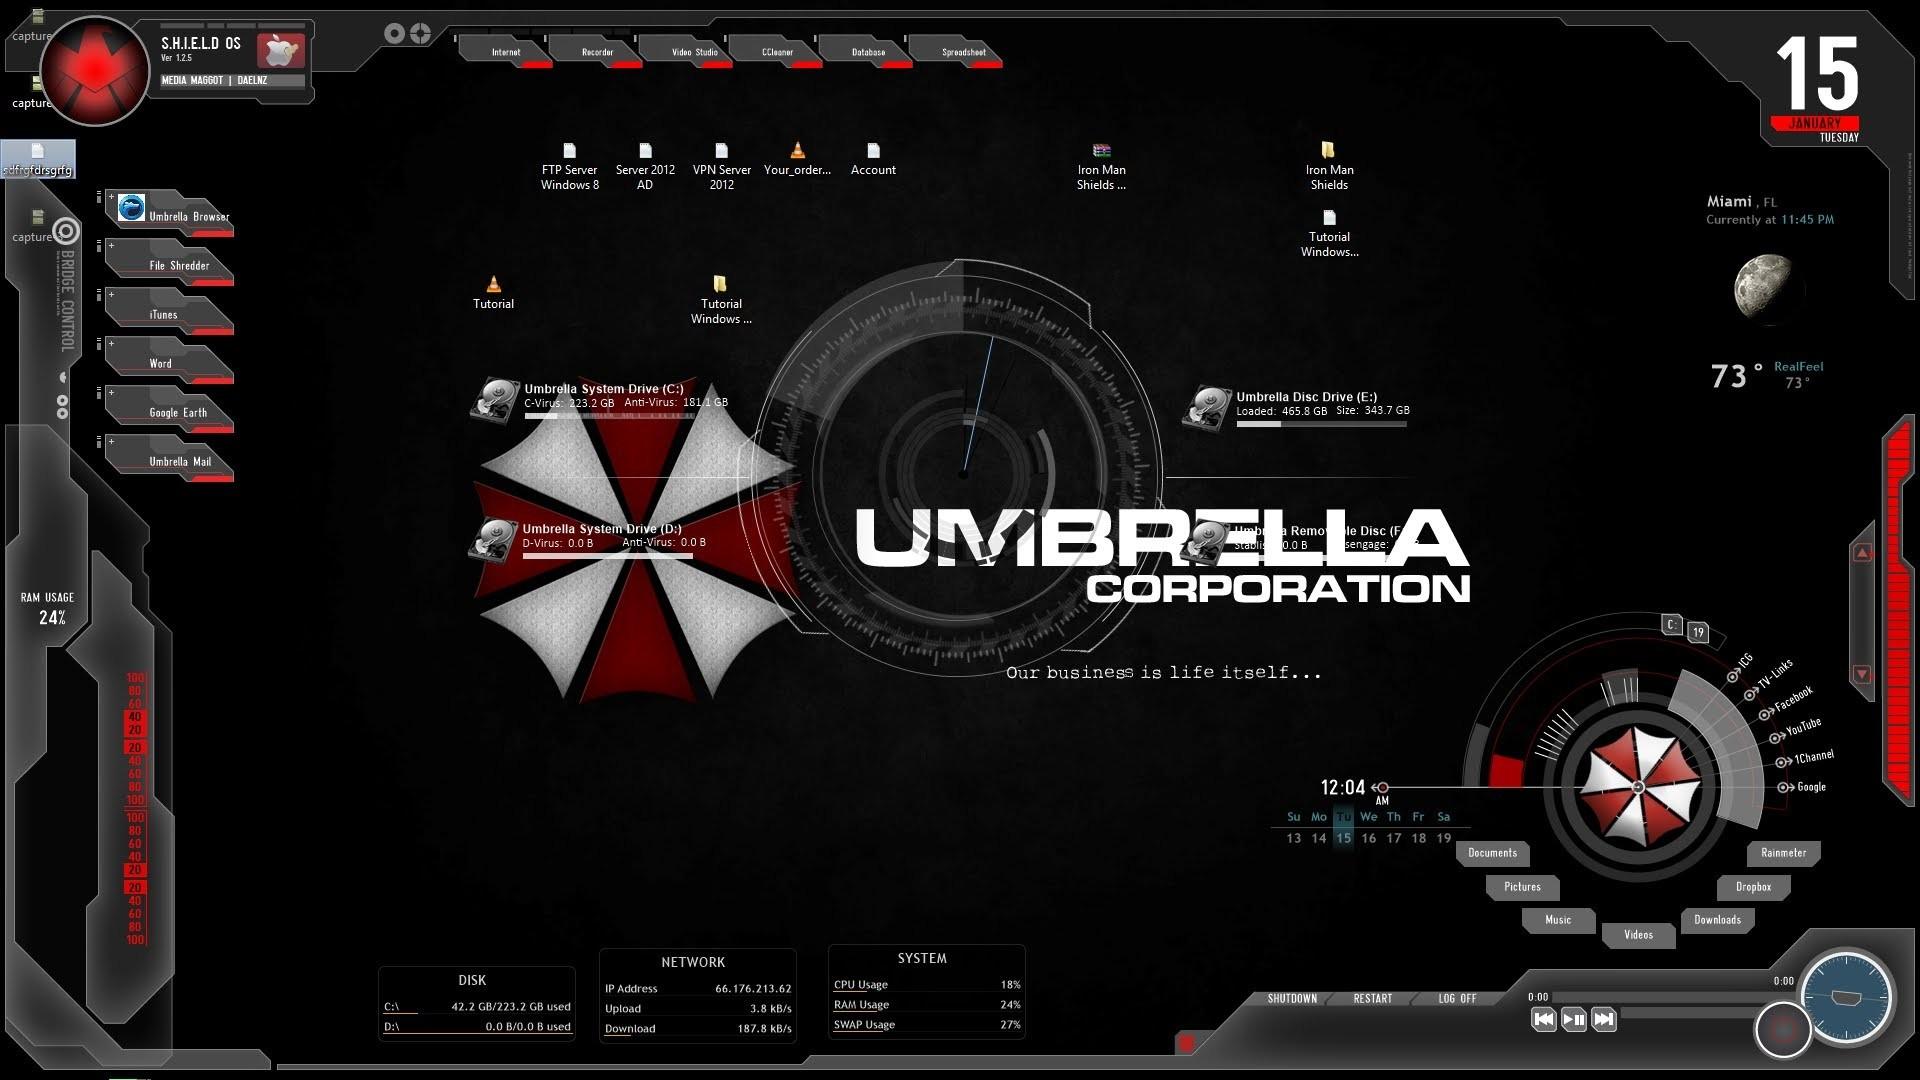 Umbrella corporation background wallpapertag - Umbrella corporation wallpaper hd 1366x768 ...